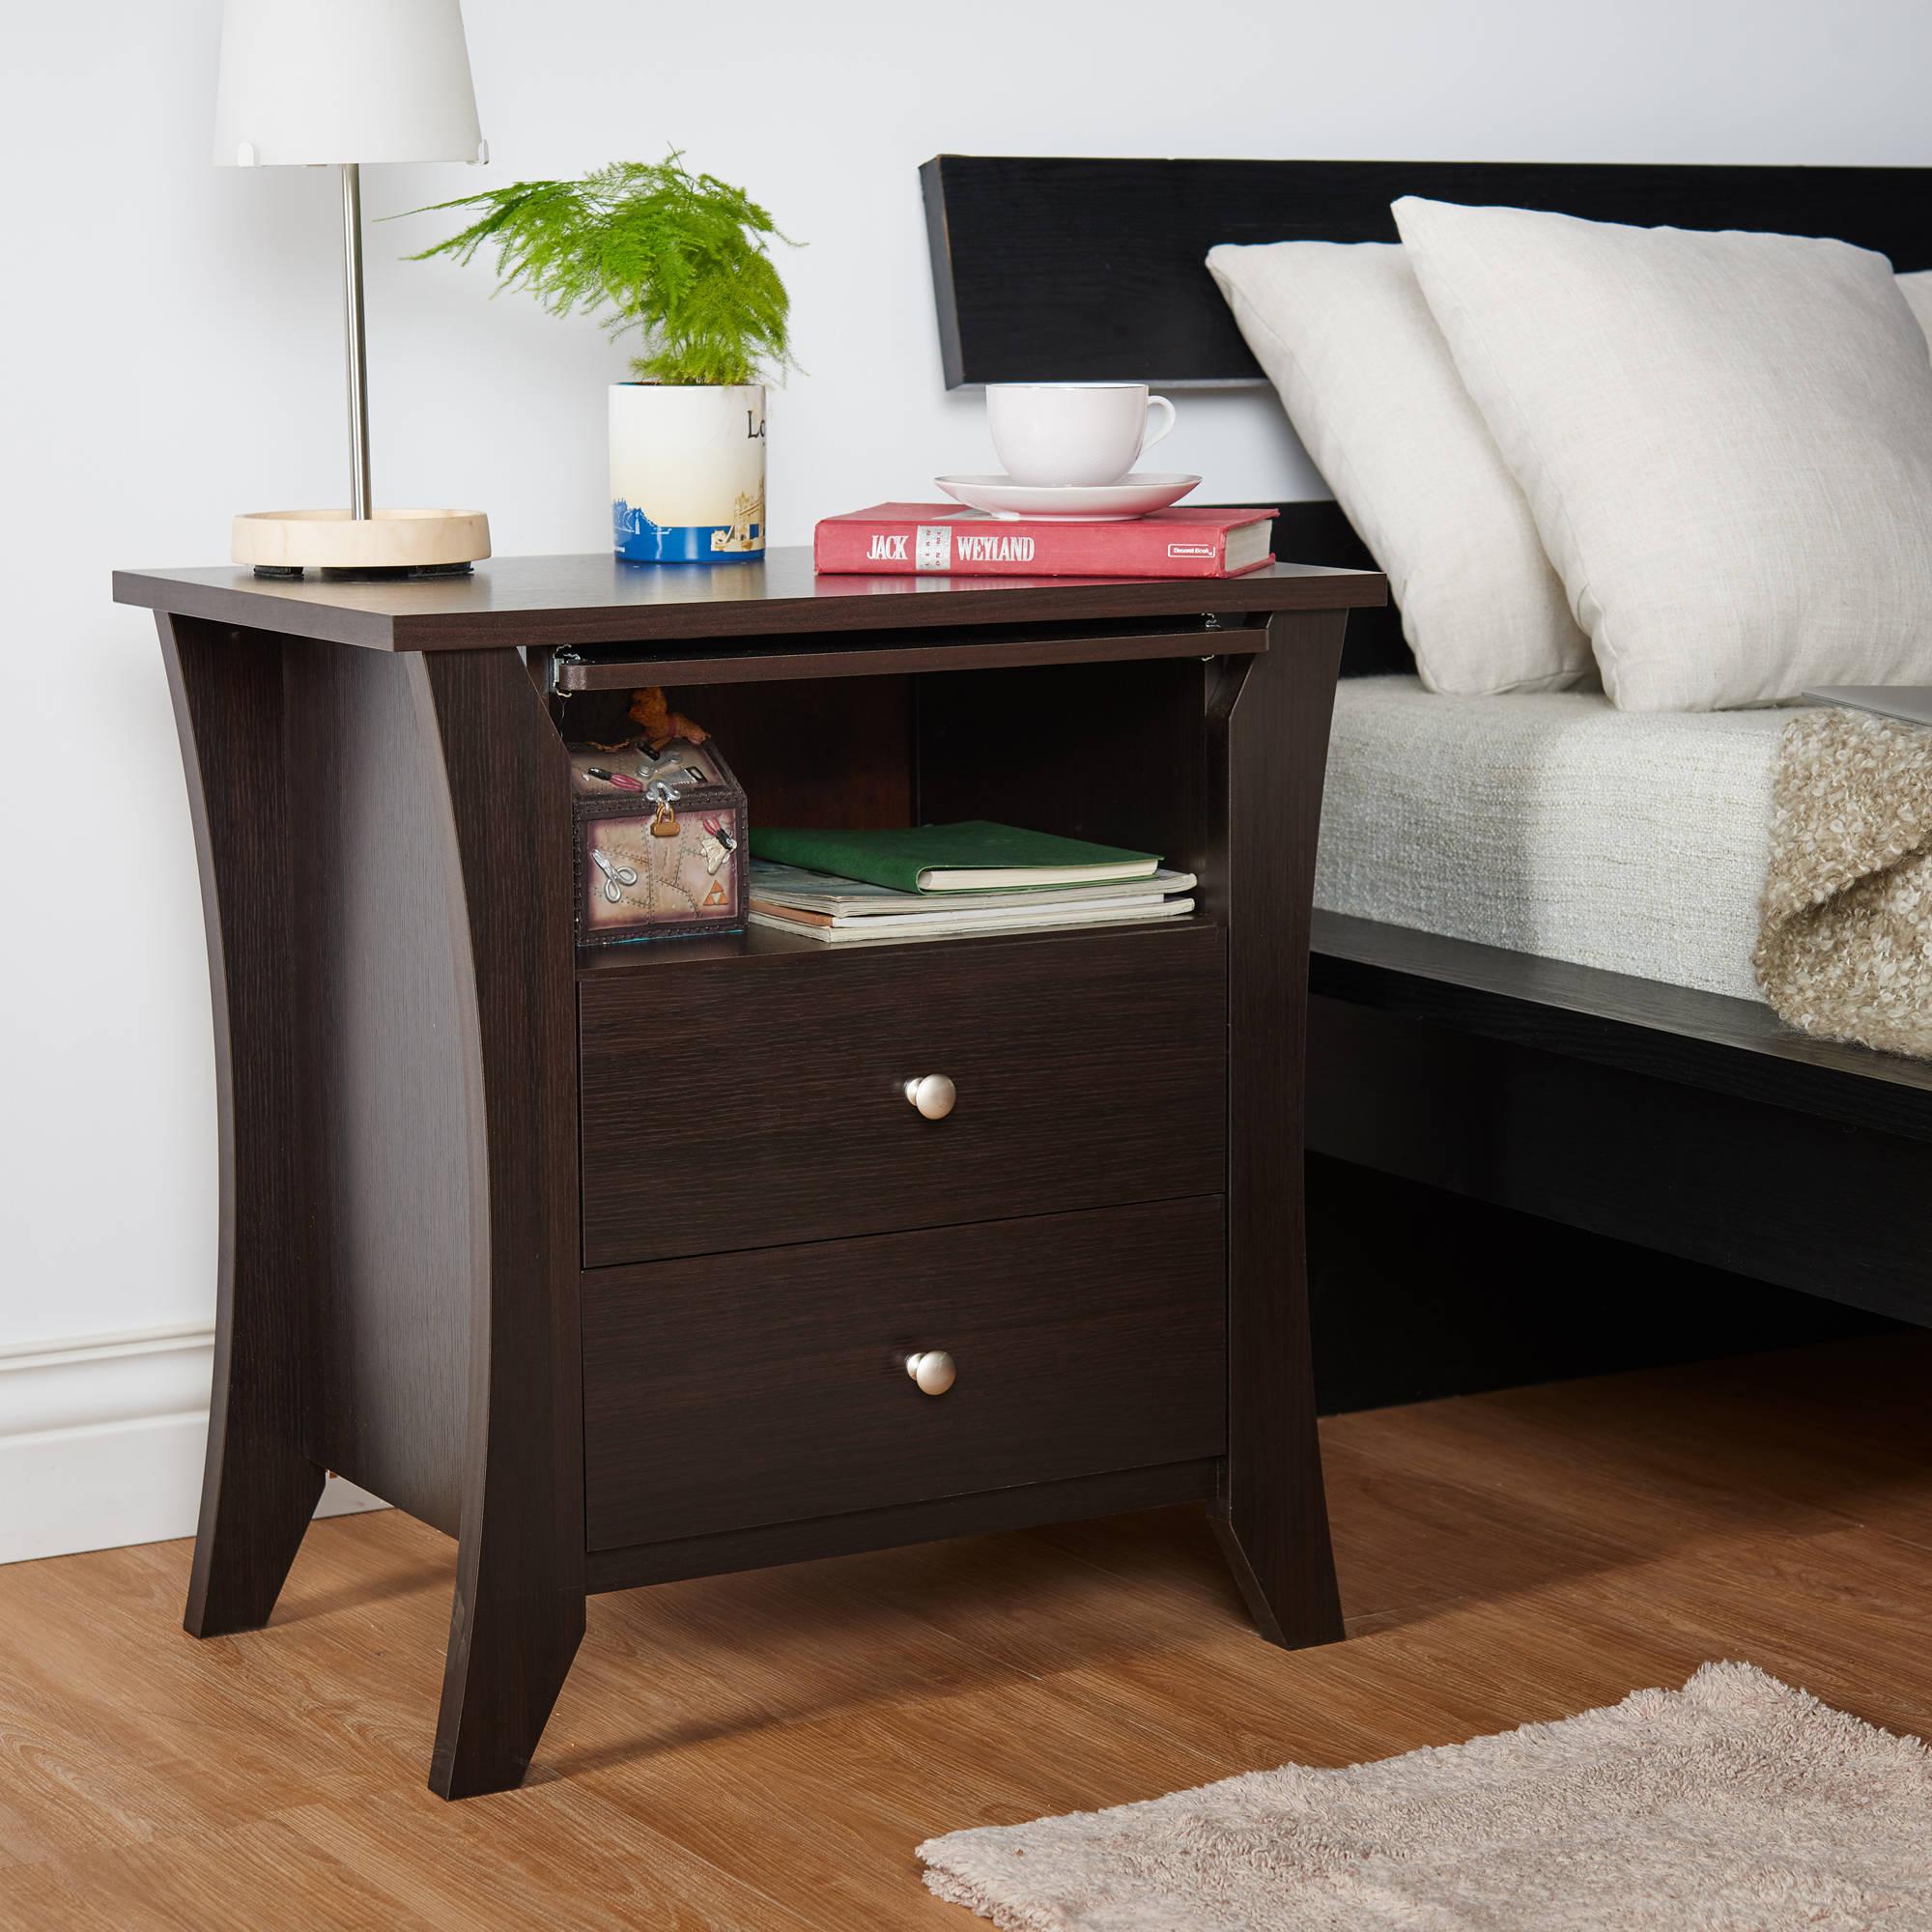 Furniture of America Carlita 2-Drawer Nightstand, Espresso